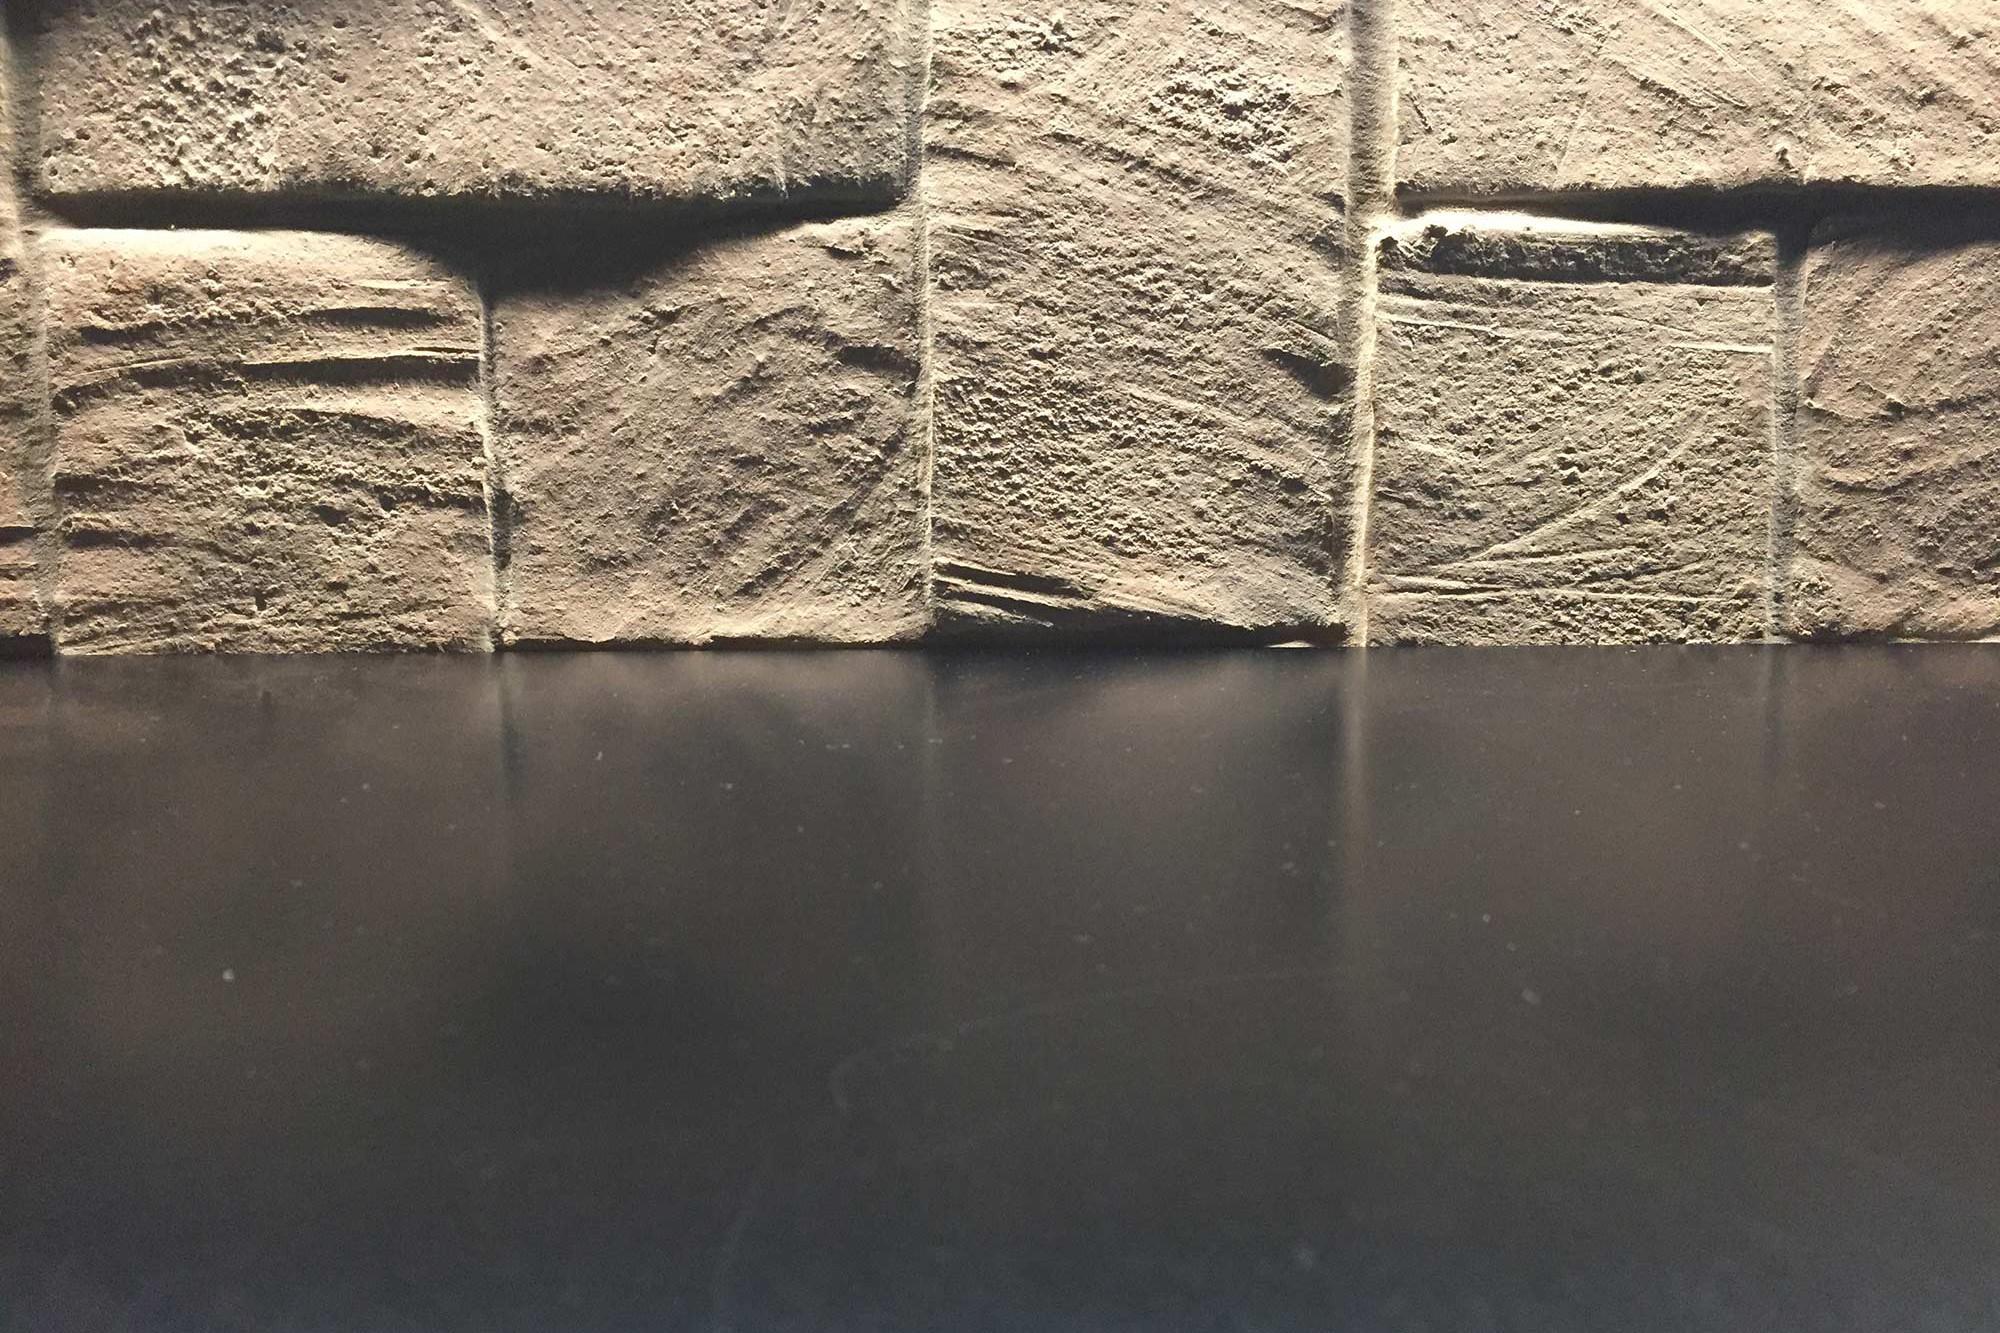 Stev - Antwerpen - Domenico Mori tegels